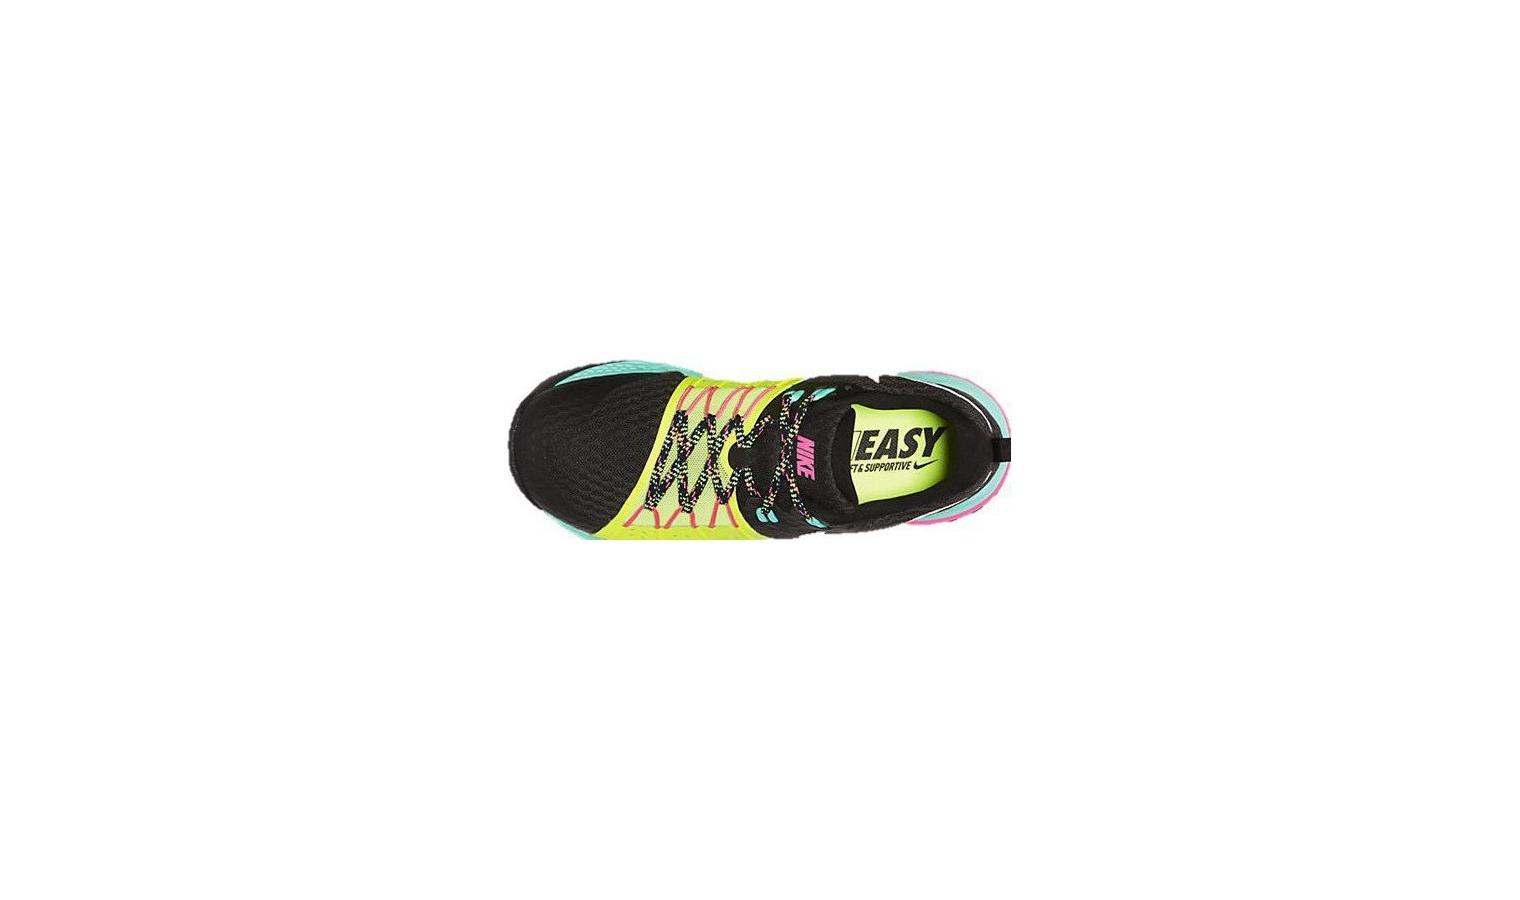 f6aad48cdf3 Dámské běžecké boty Nike AIR ZOOM WILDHORSE 4 W černé